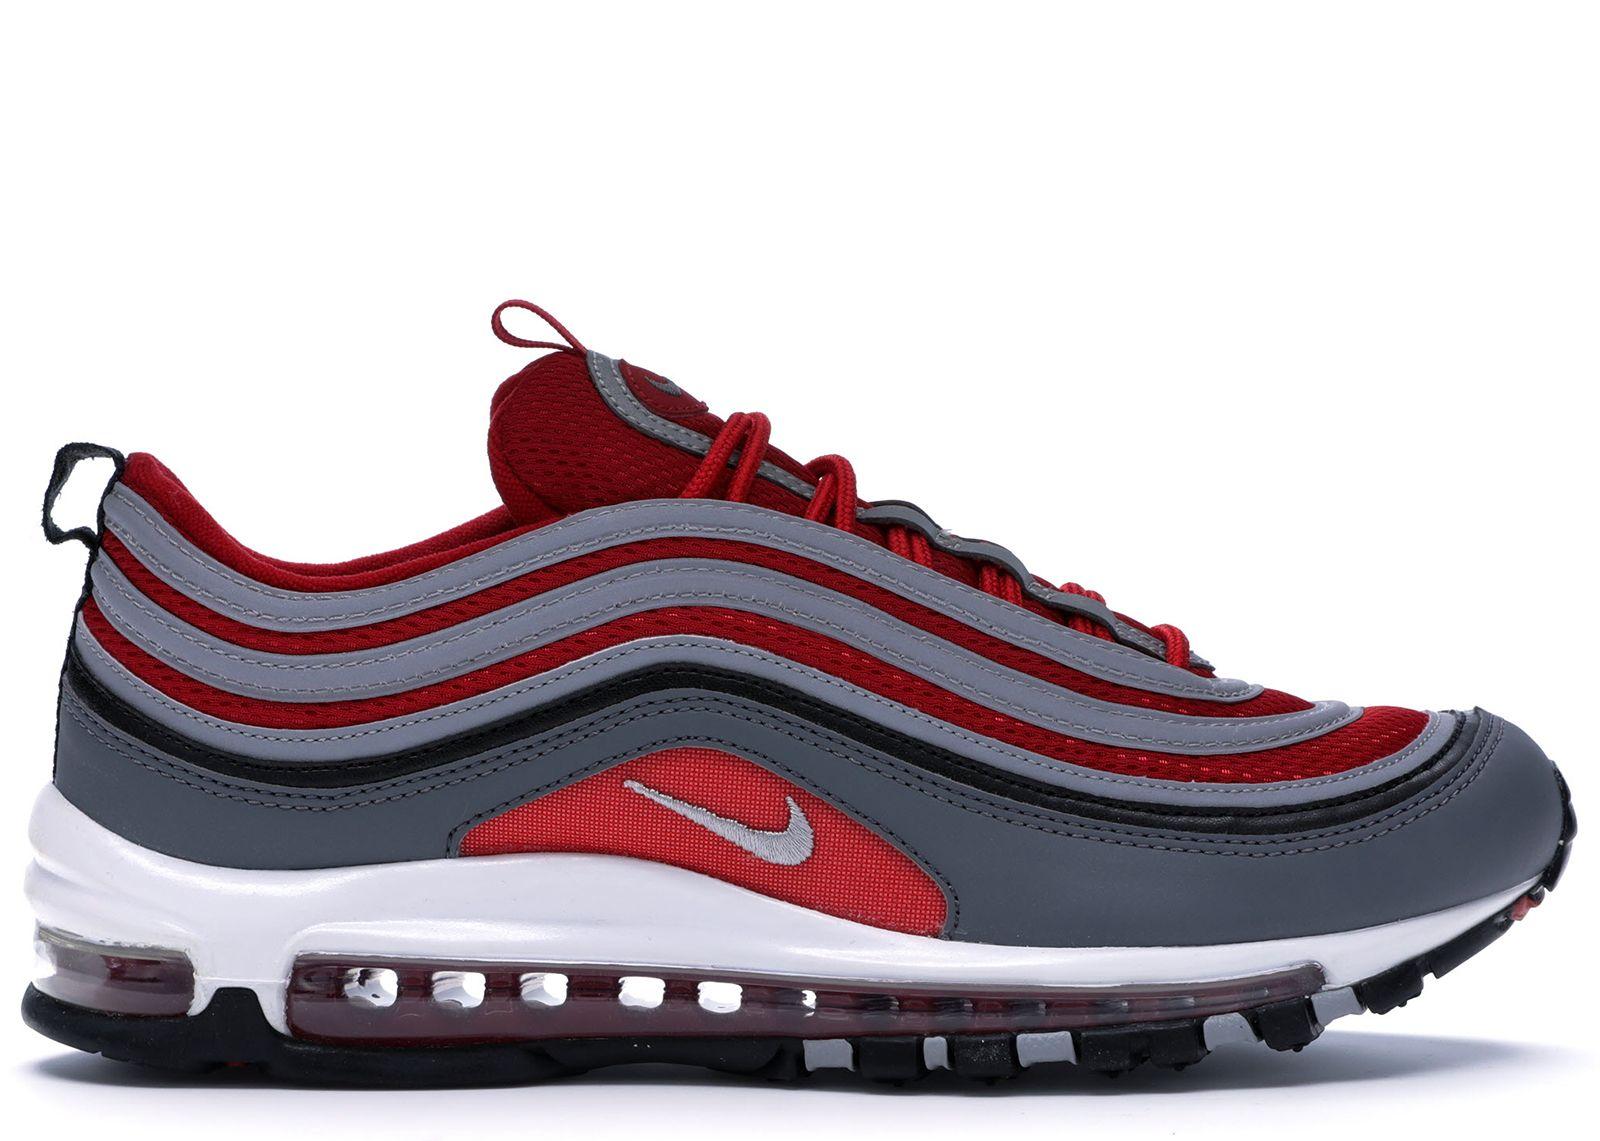 Nike Air Max 97 Dark Grey Gym Red In